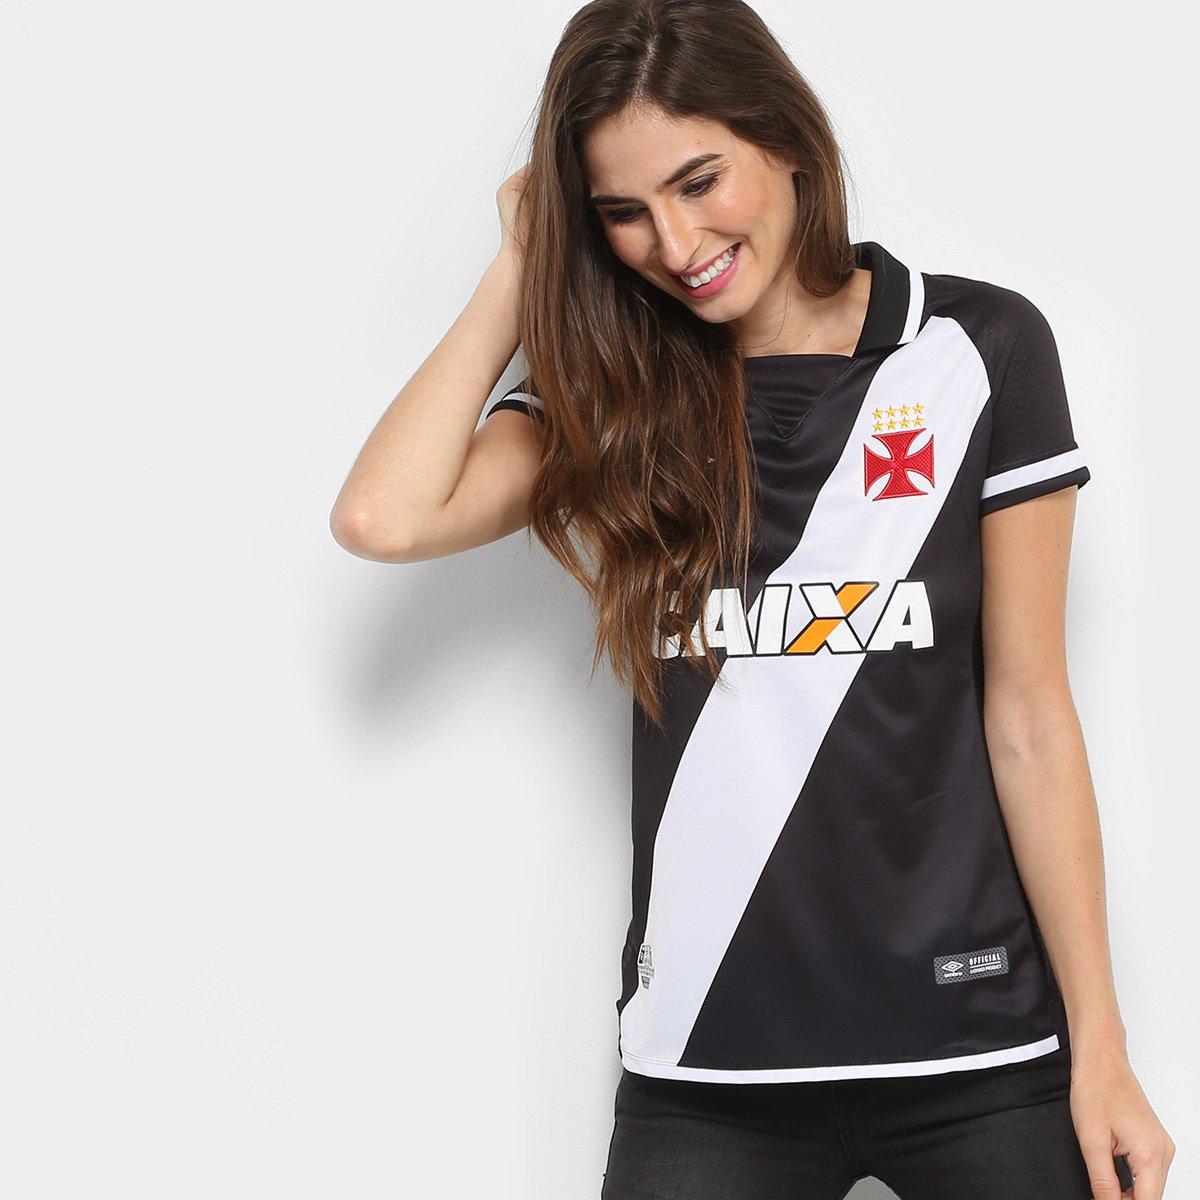 da518ab0aad13 Camisa Vasco I s n° 17 18 - Torcedor Umbro Feminina - Compre Agora ...